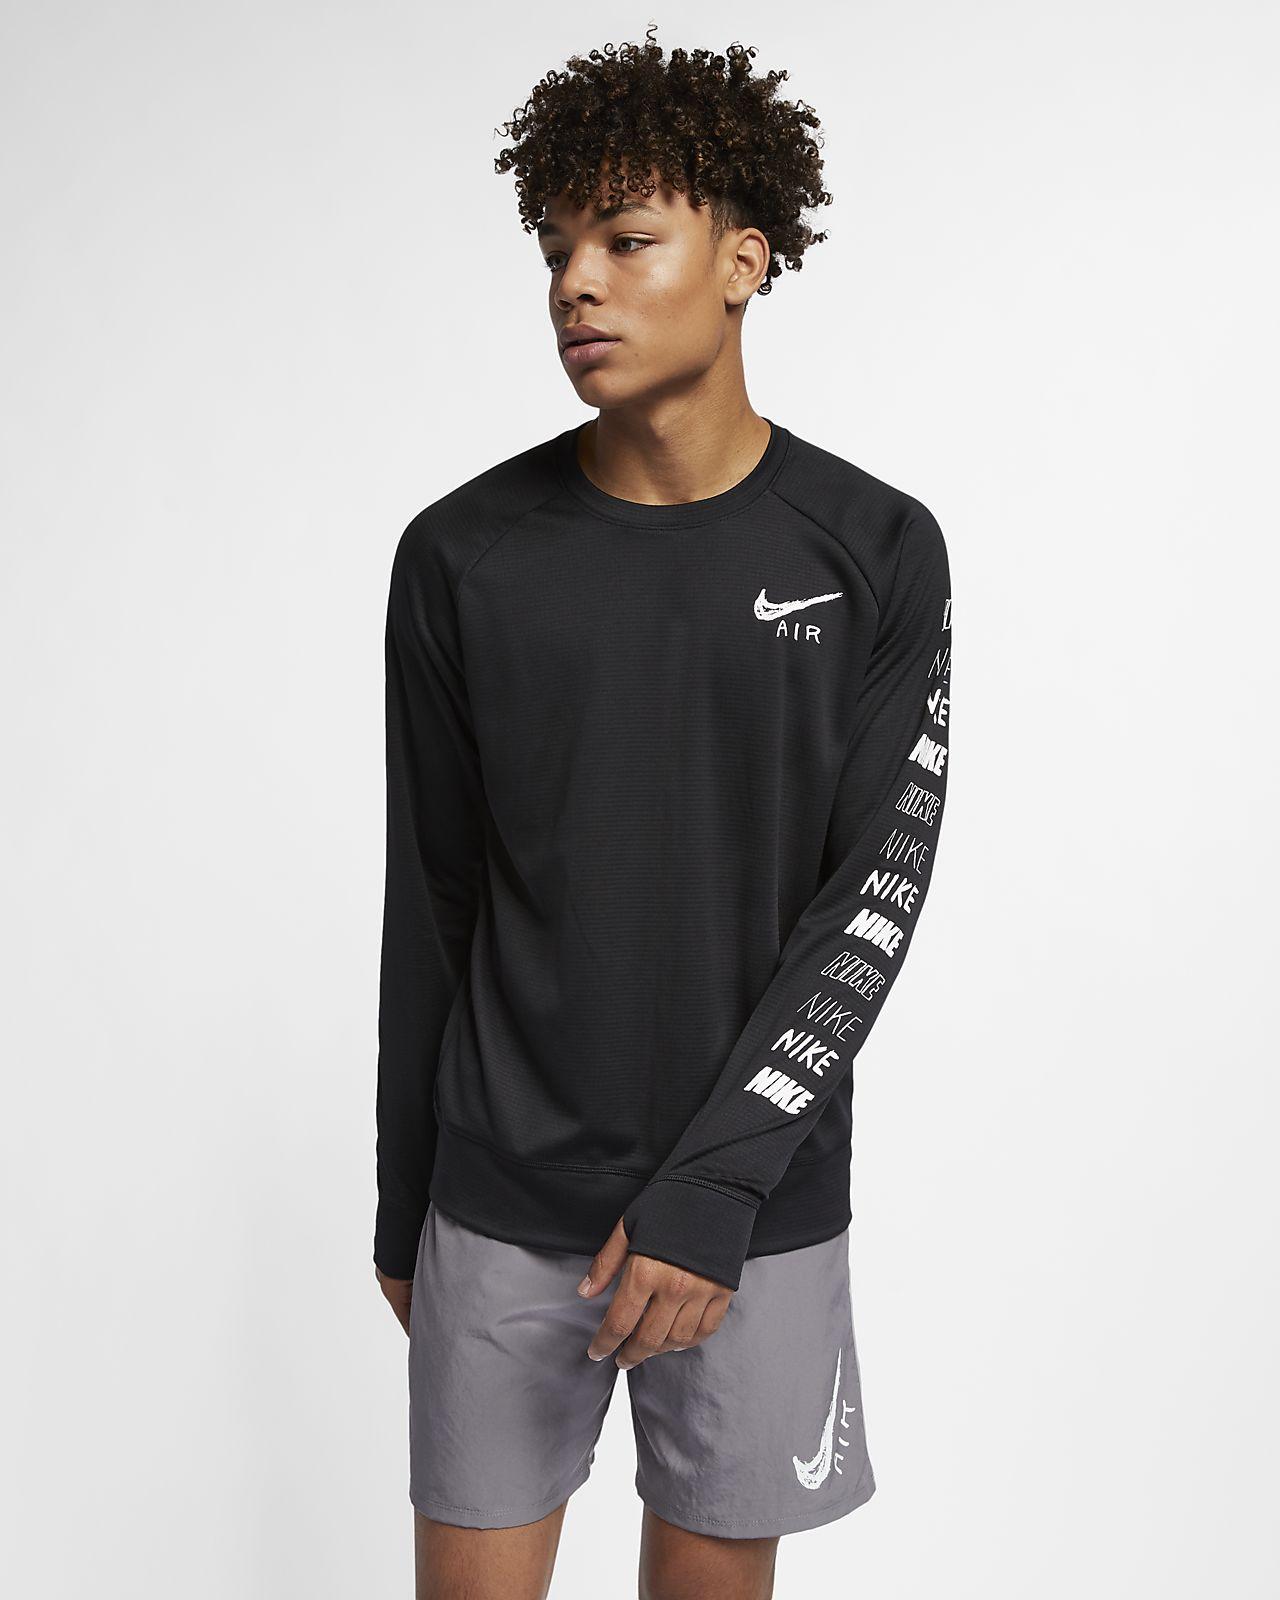 3aa59870e Męska koszulka do biegania Nike Pacer. Nike.com PL